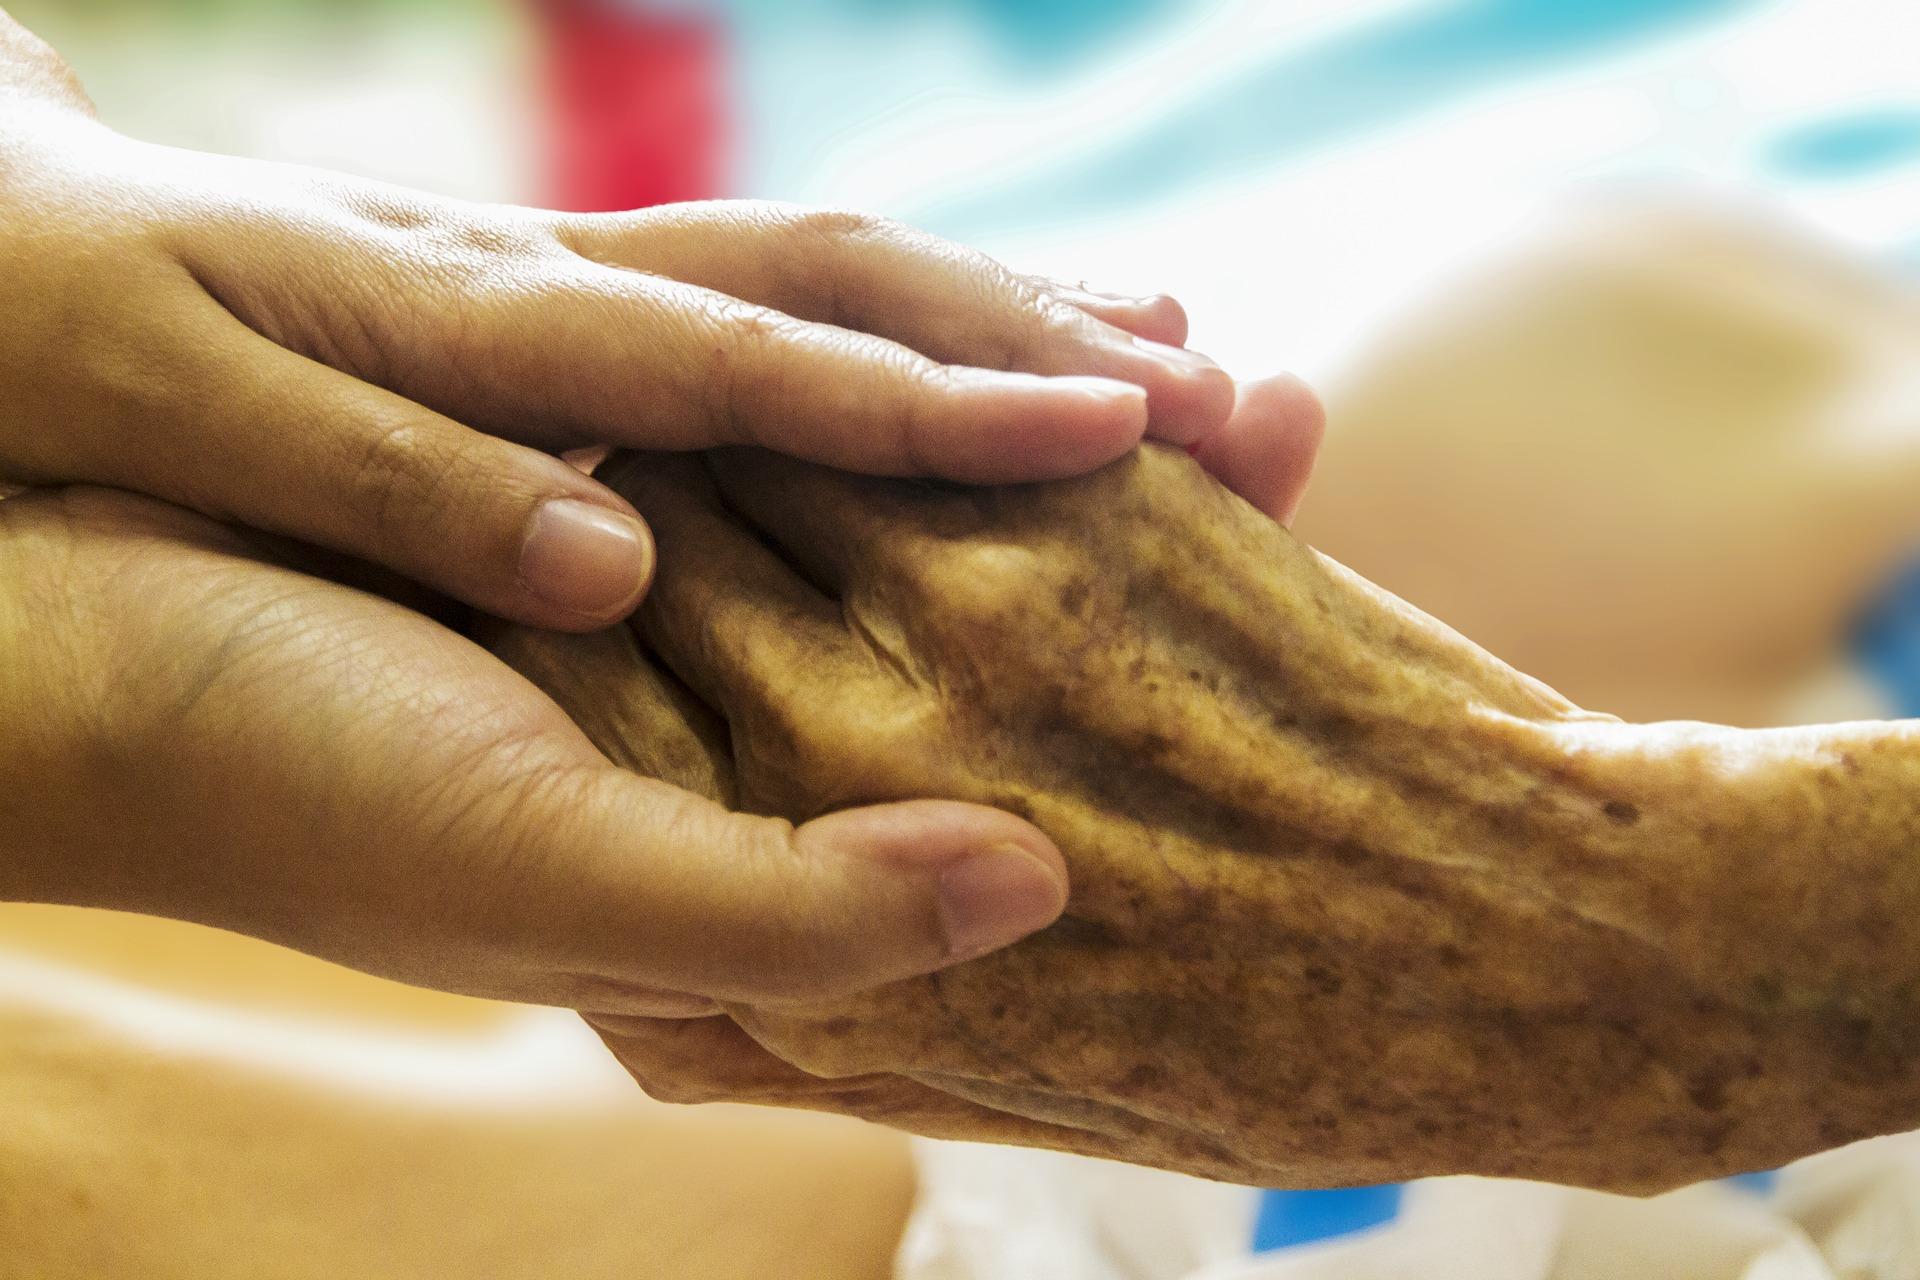 Le Cure Infermieristiche Mancate (Missed Nursing Care) sono un dato utile ai leader infermieristici?